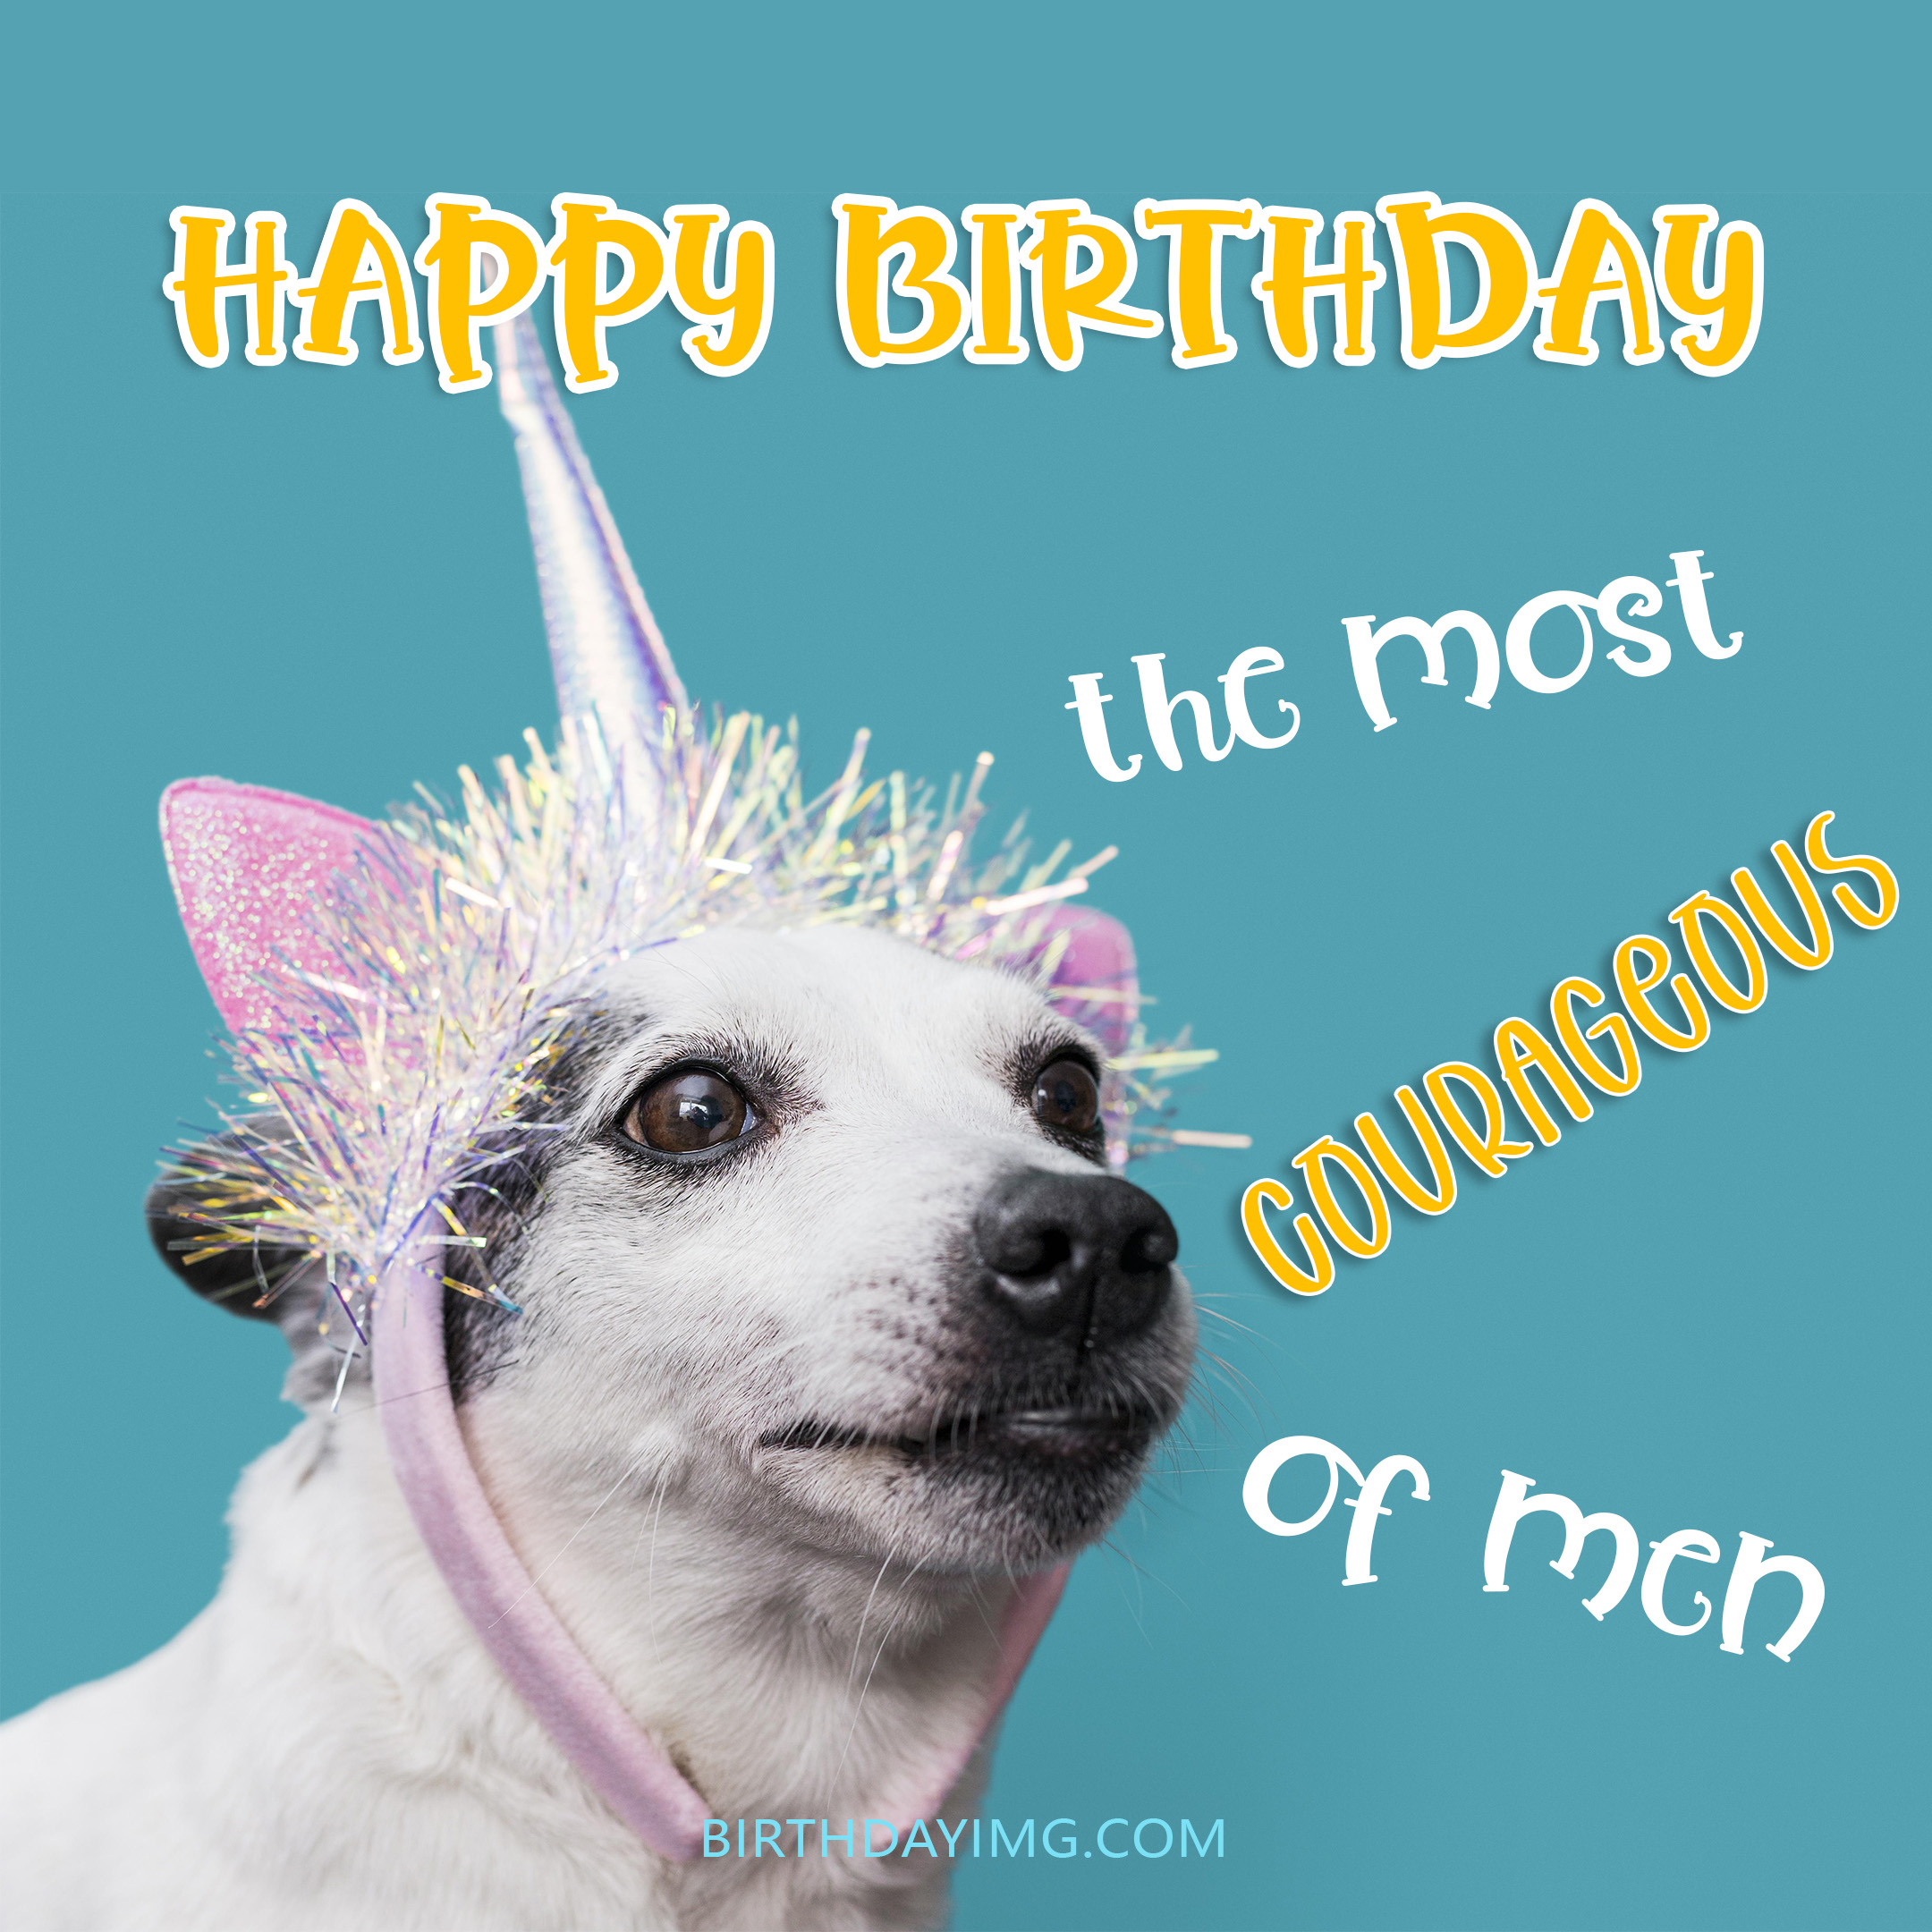 Free Happy Birthday Image For Him (Man) With Funny Big Dog - birthdayimg.com